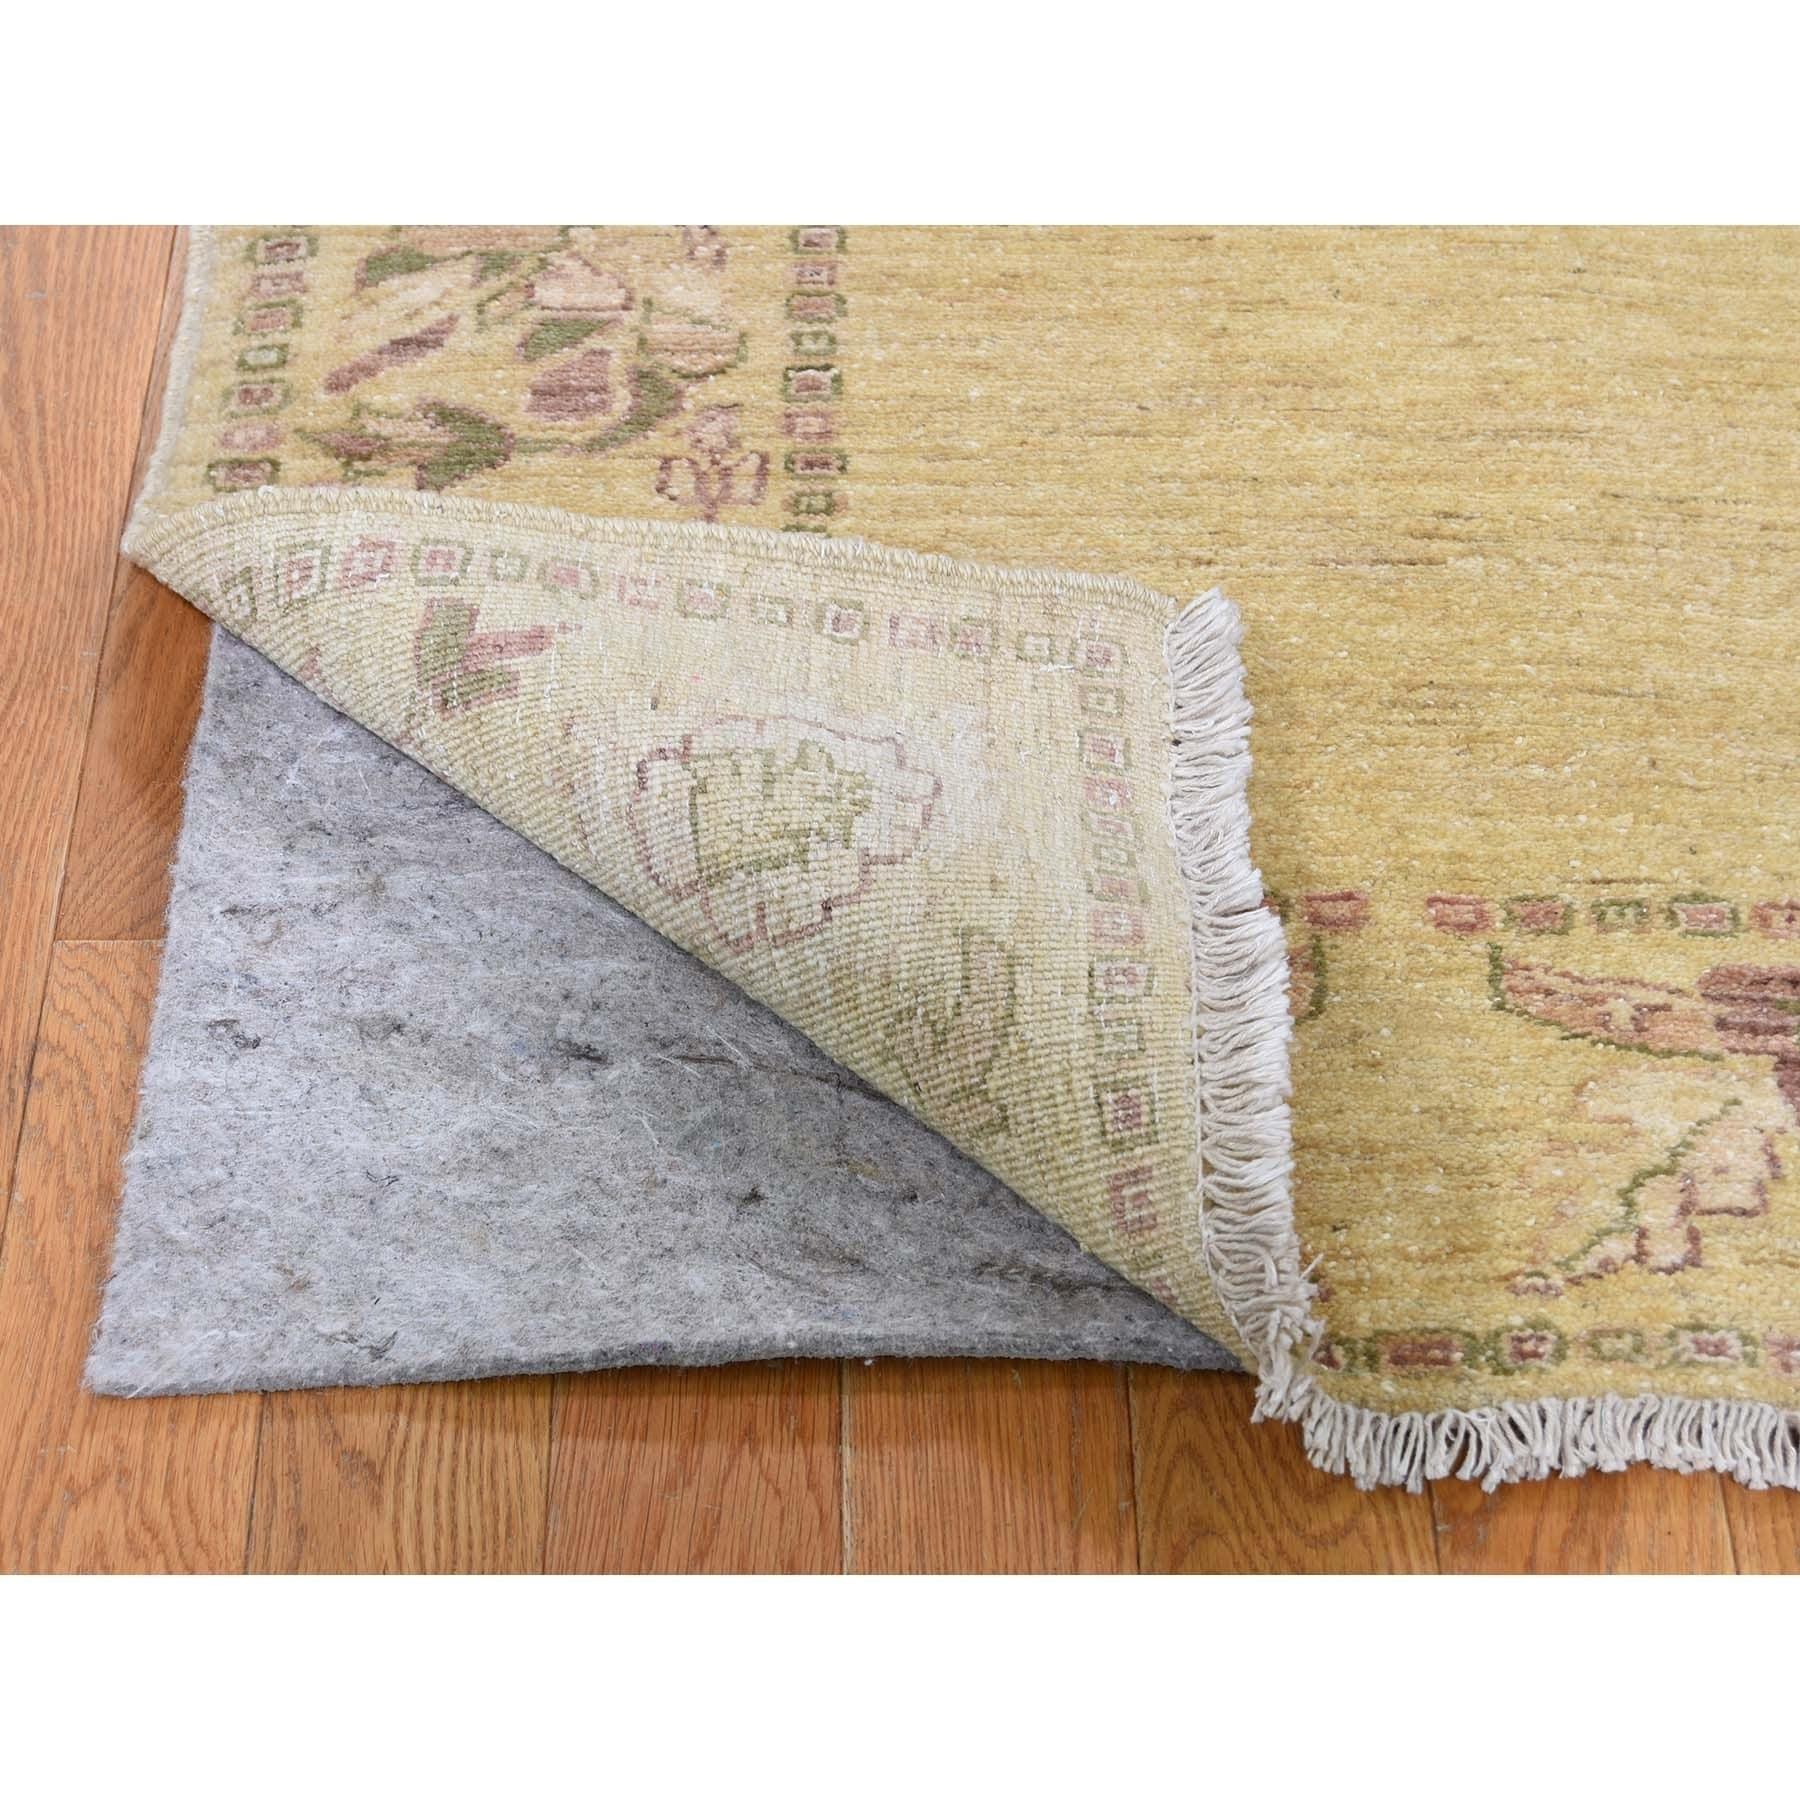 Shahbanu Rugs Pure Wool Peshawar With Plain Field Hand Knotted Runner Oriental Rug 2 10 X 9 8 2 10 X 9 8